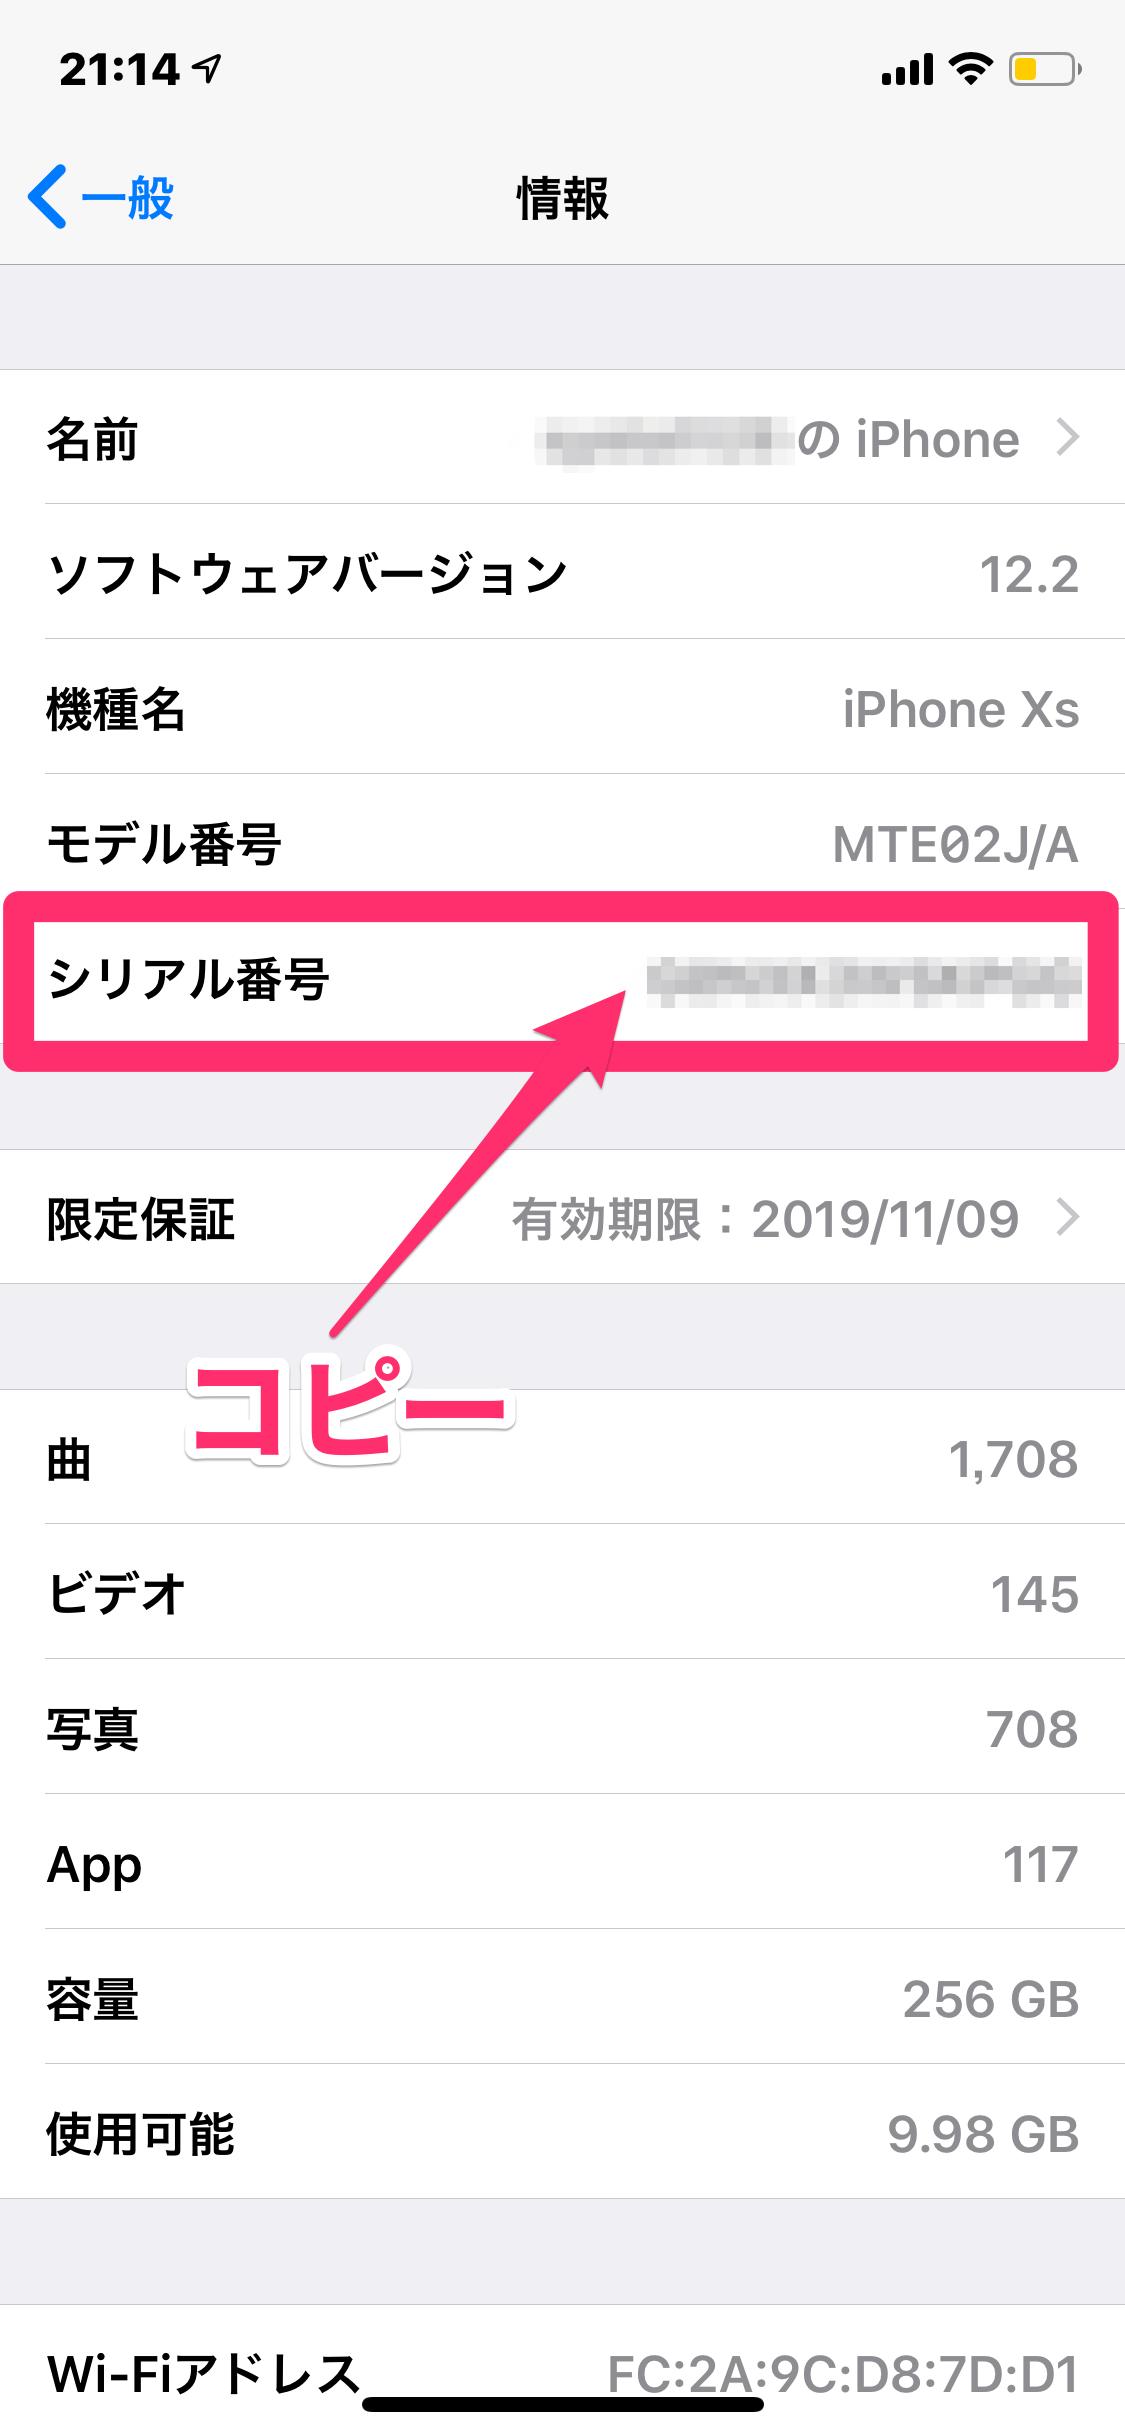 iPhoneシリアル番号